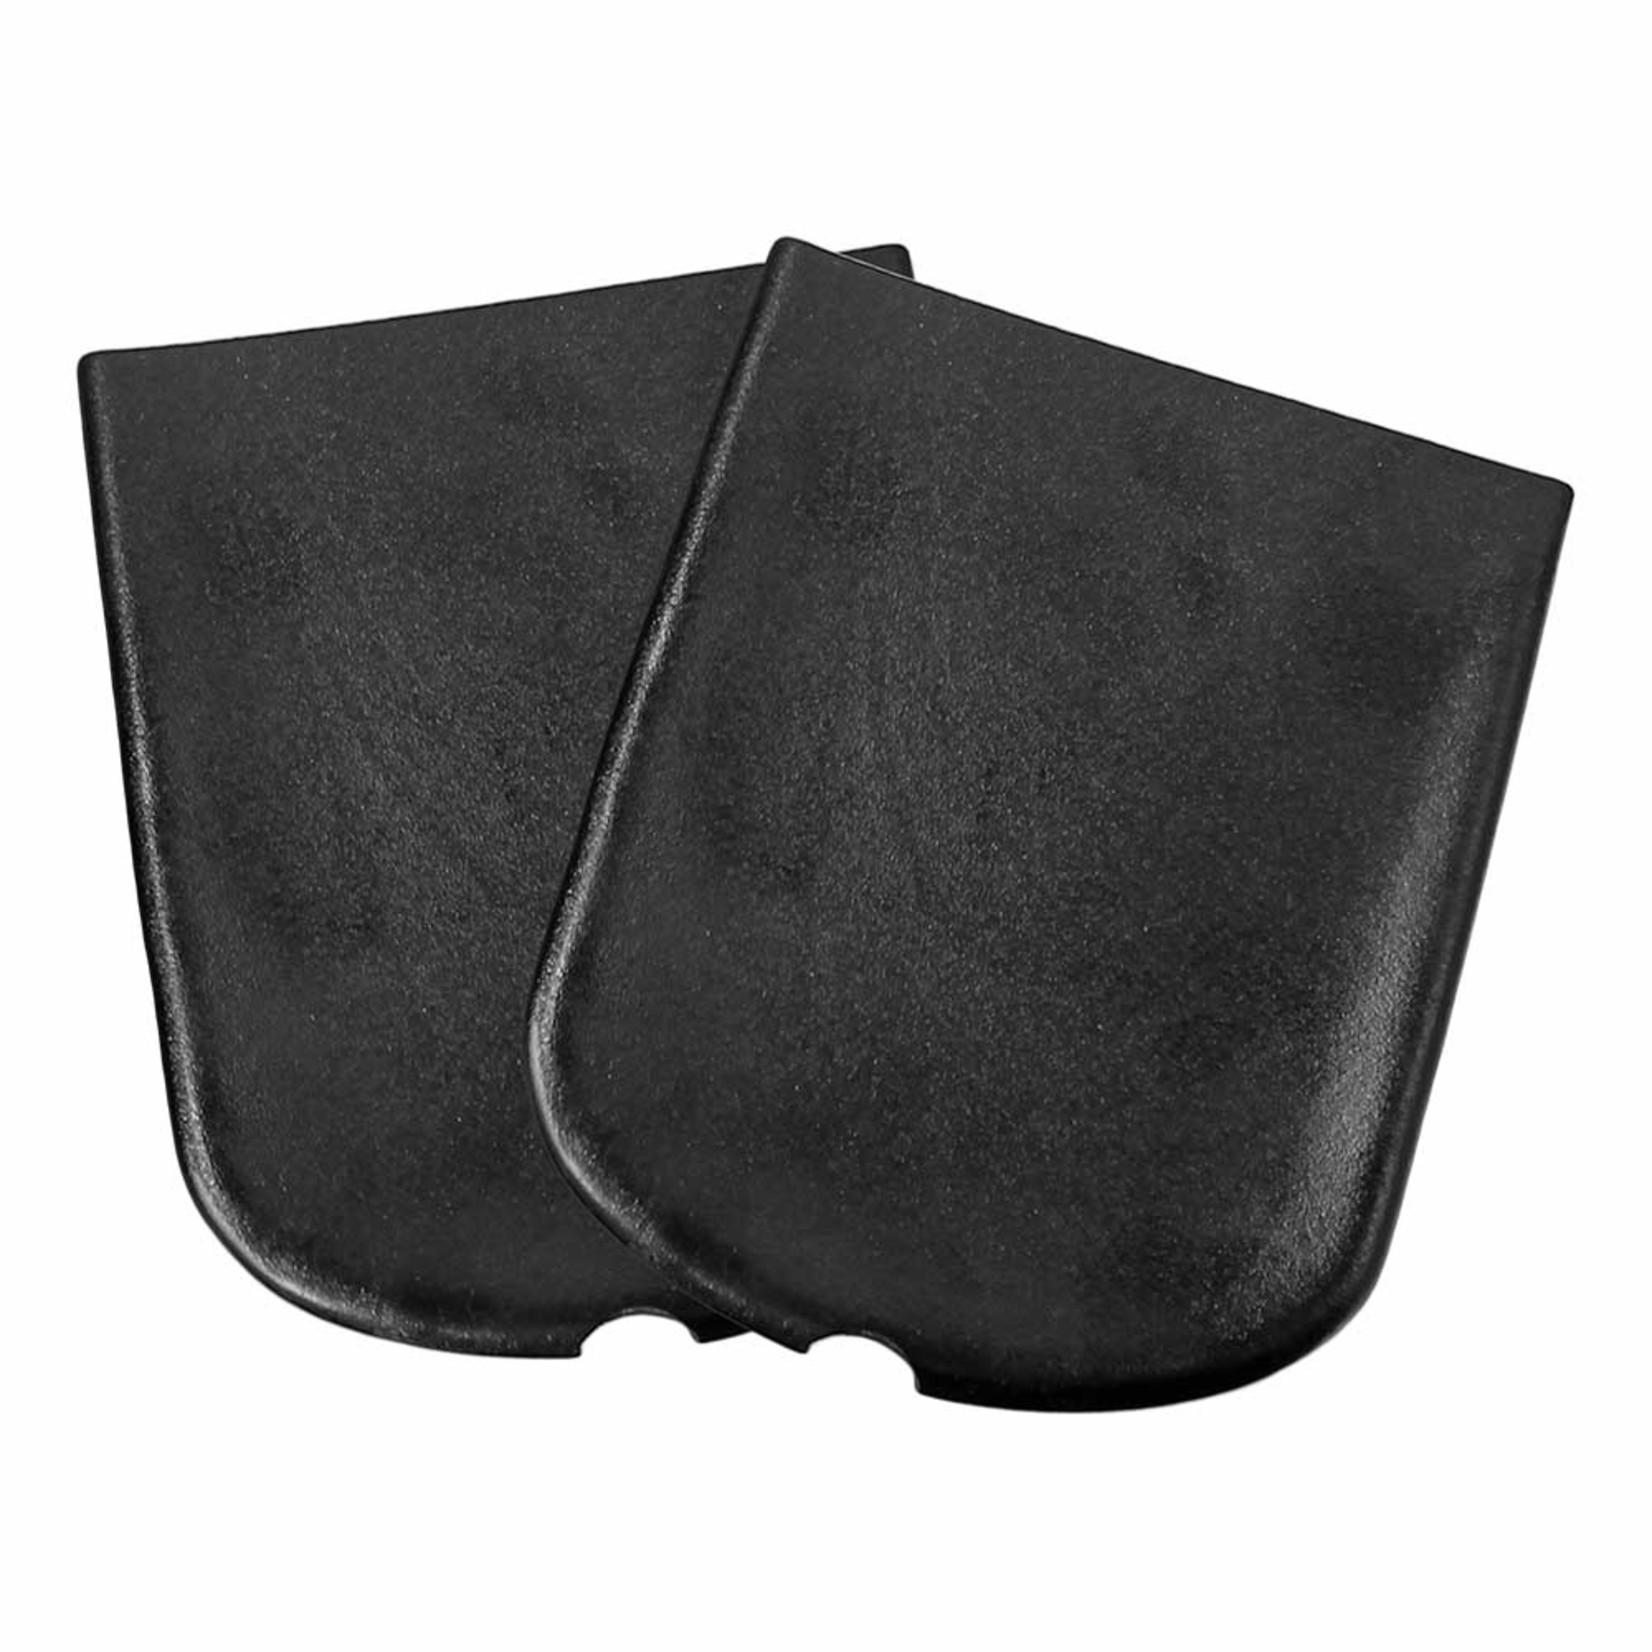 "Sawyer Paddle & Oars Sawyer Vinyl Oar Tip Protector, 5-1/2"" Black Cap Narrow (Pair)"